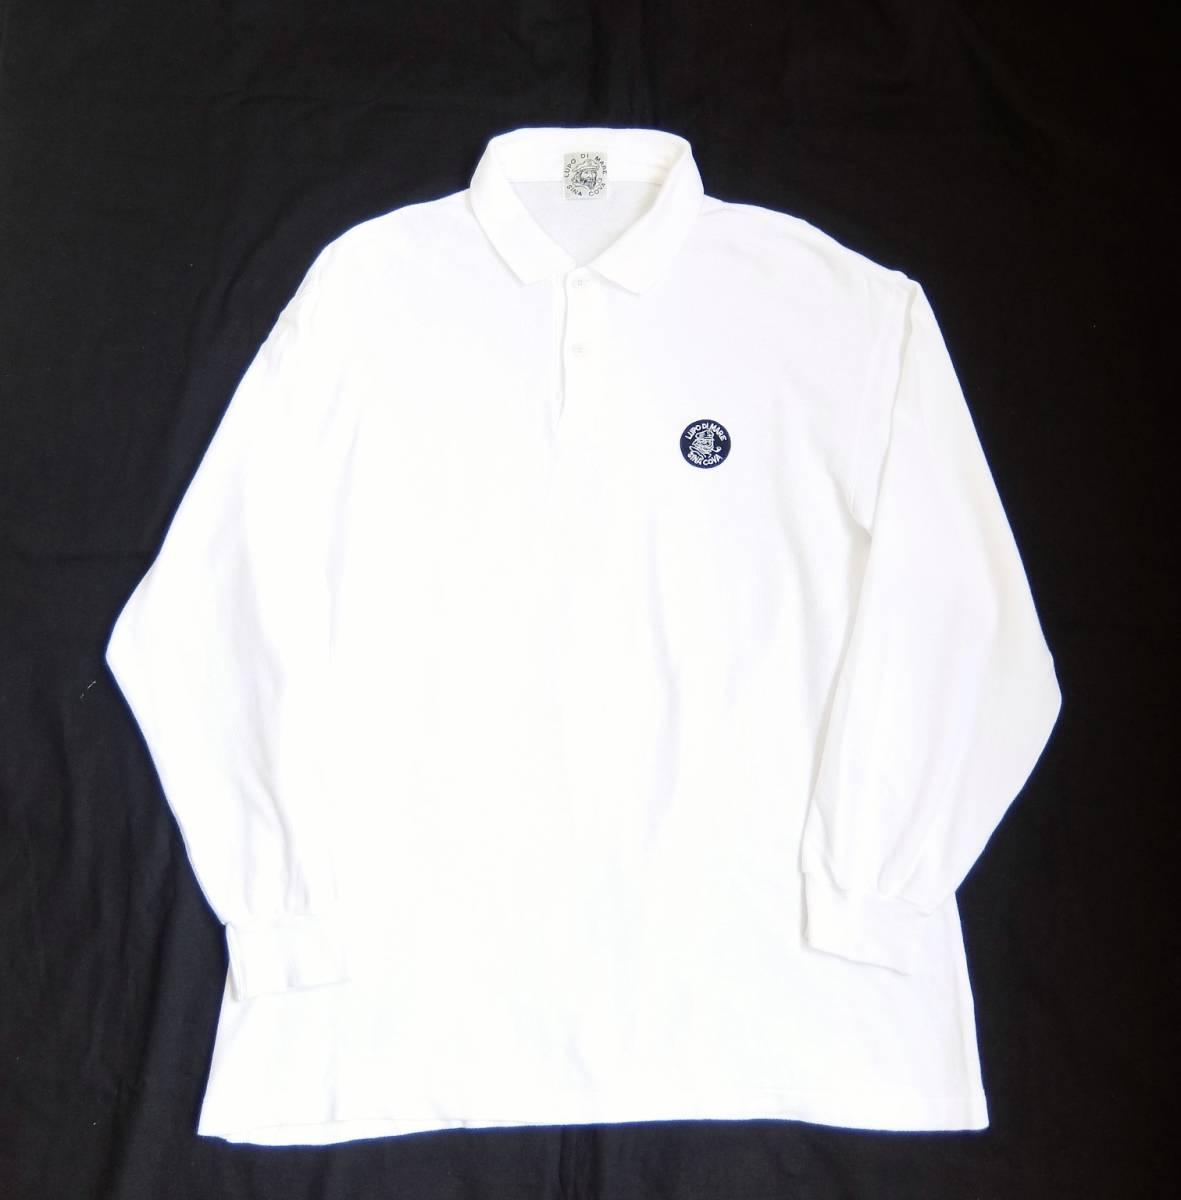 SINA COVA シナコバ ワッペン付き 長袖 ポロシャツ ホワイト Lサイズ_画像4